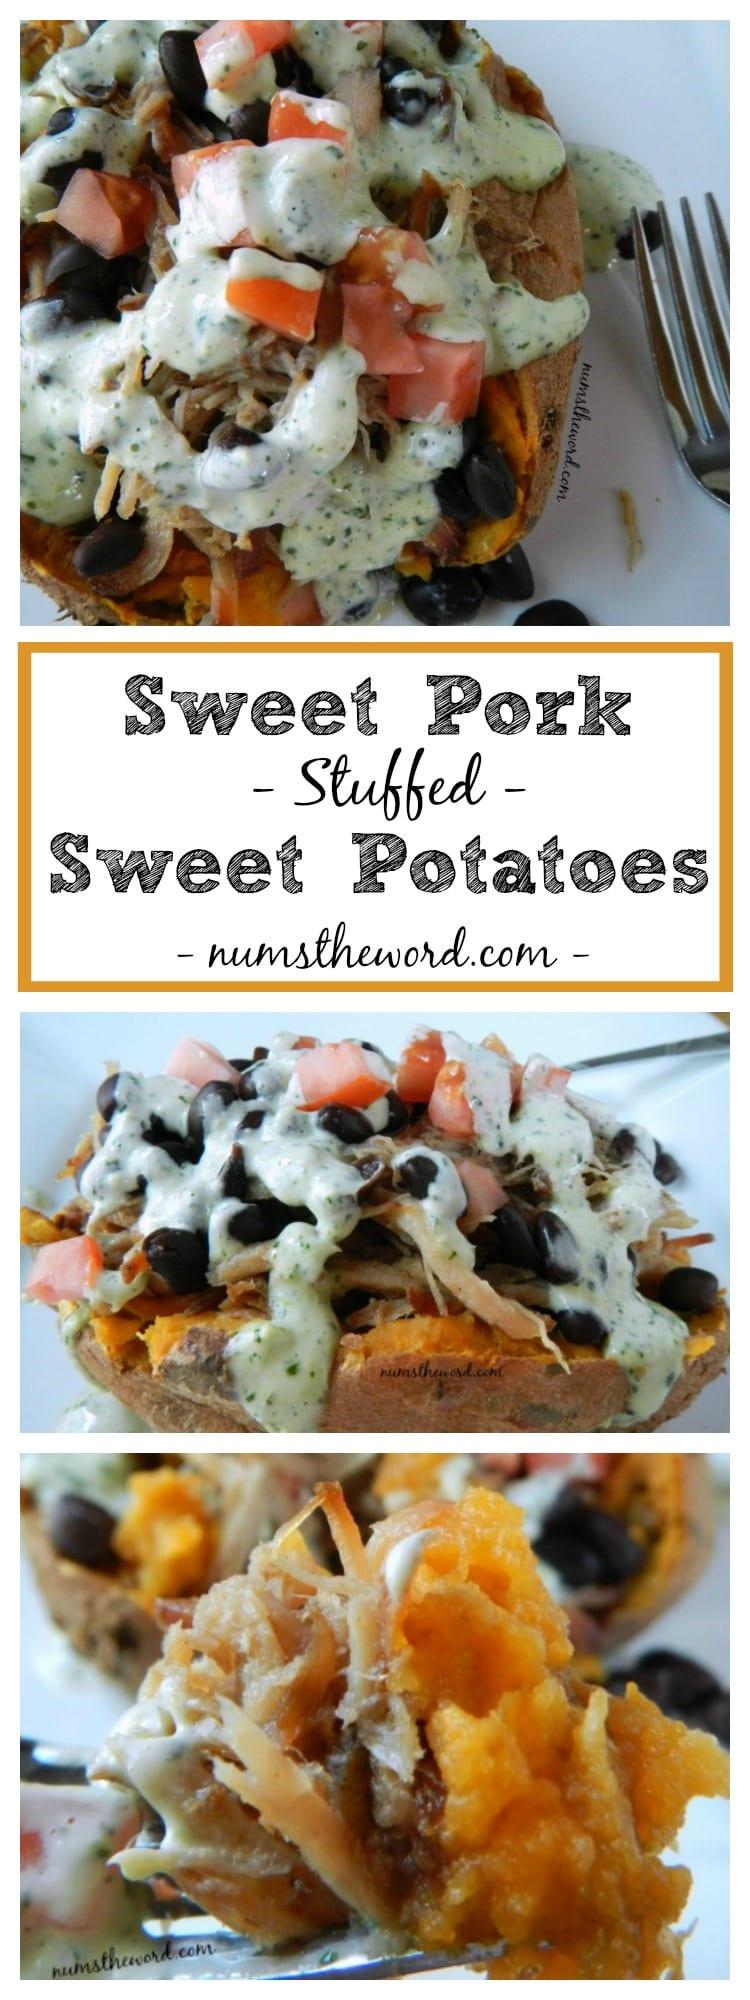 Sweet Pork Stuffed Sweet Potatoes